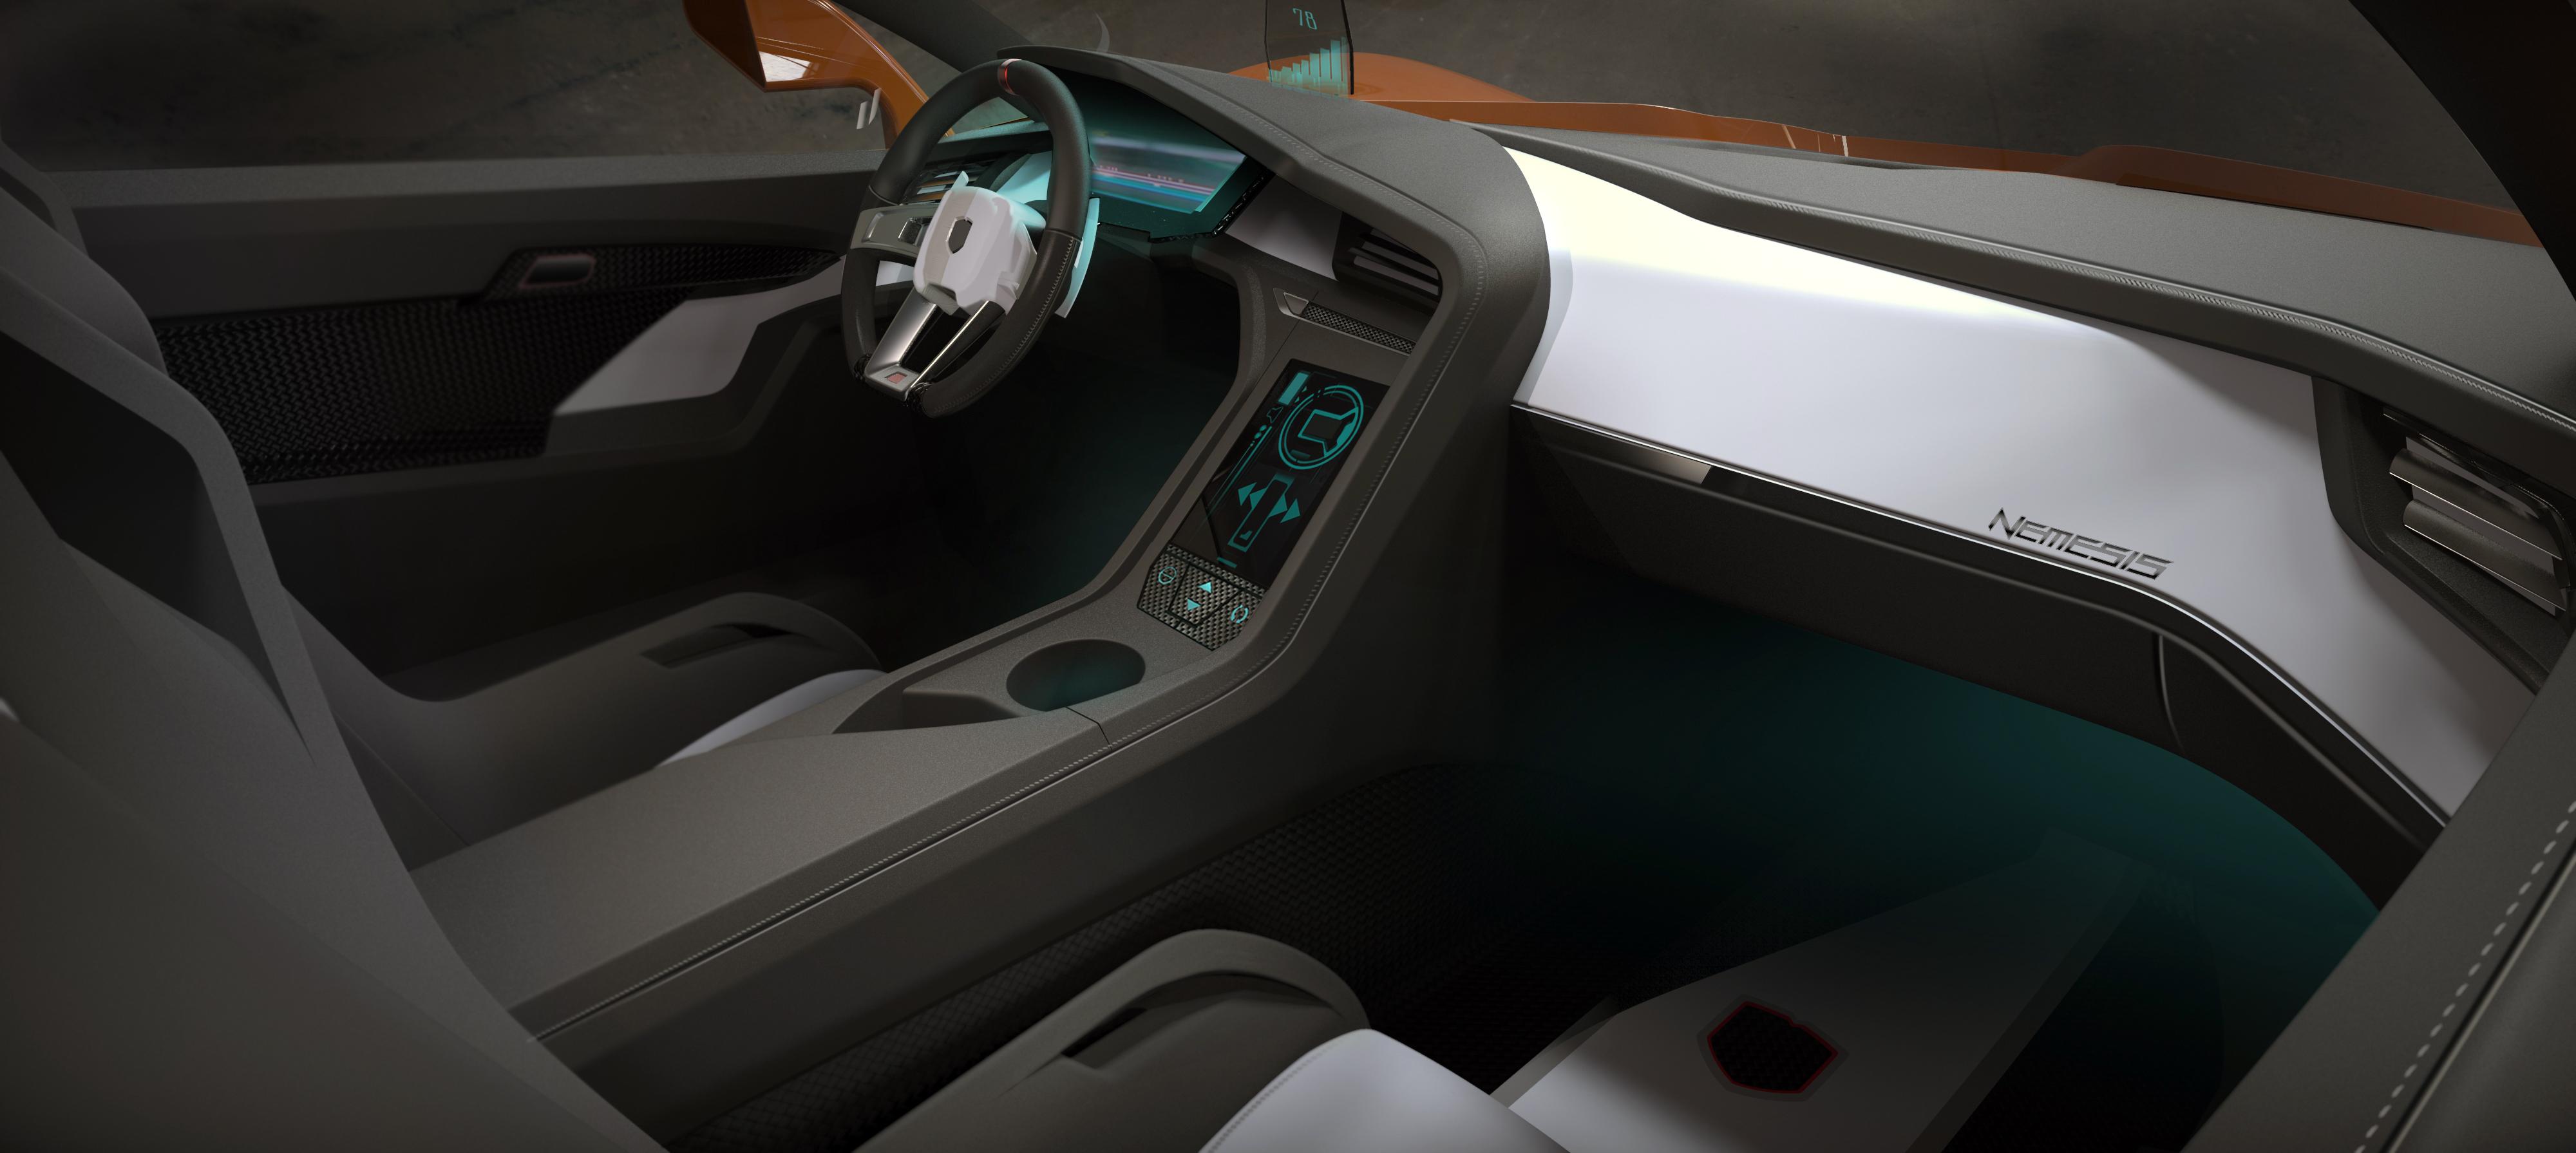 Nemesis Interior